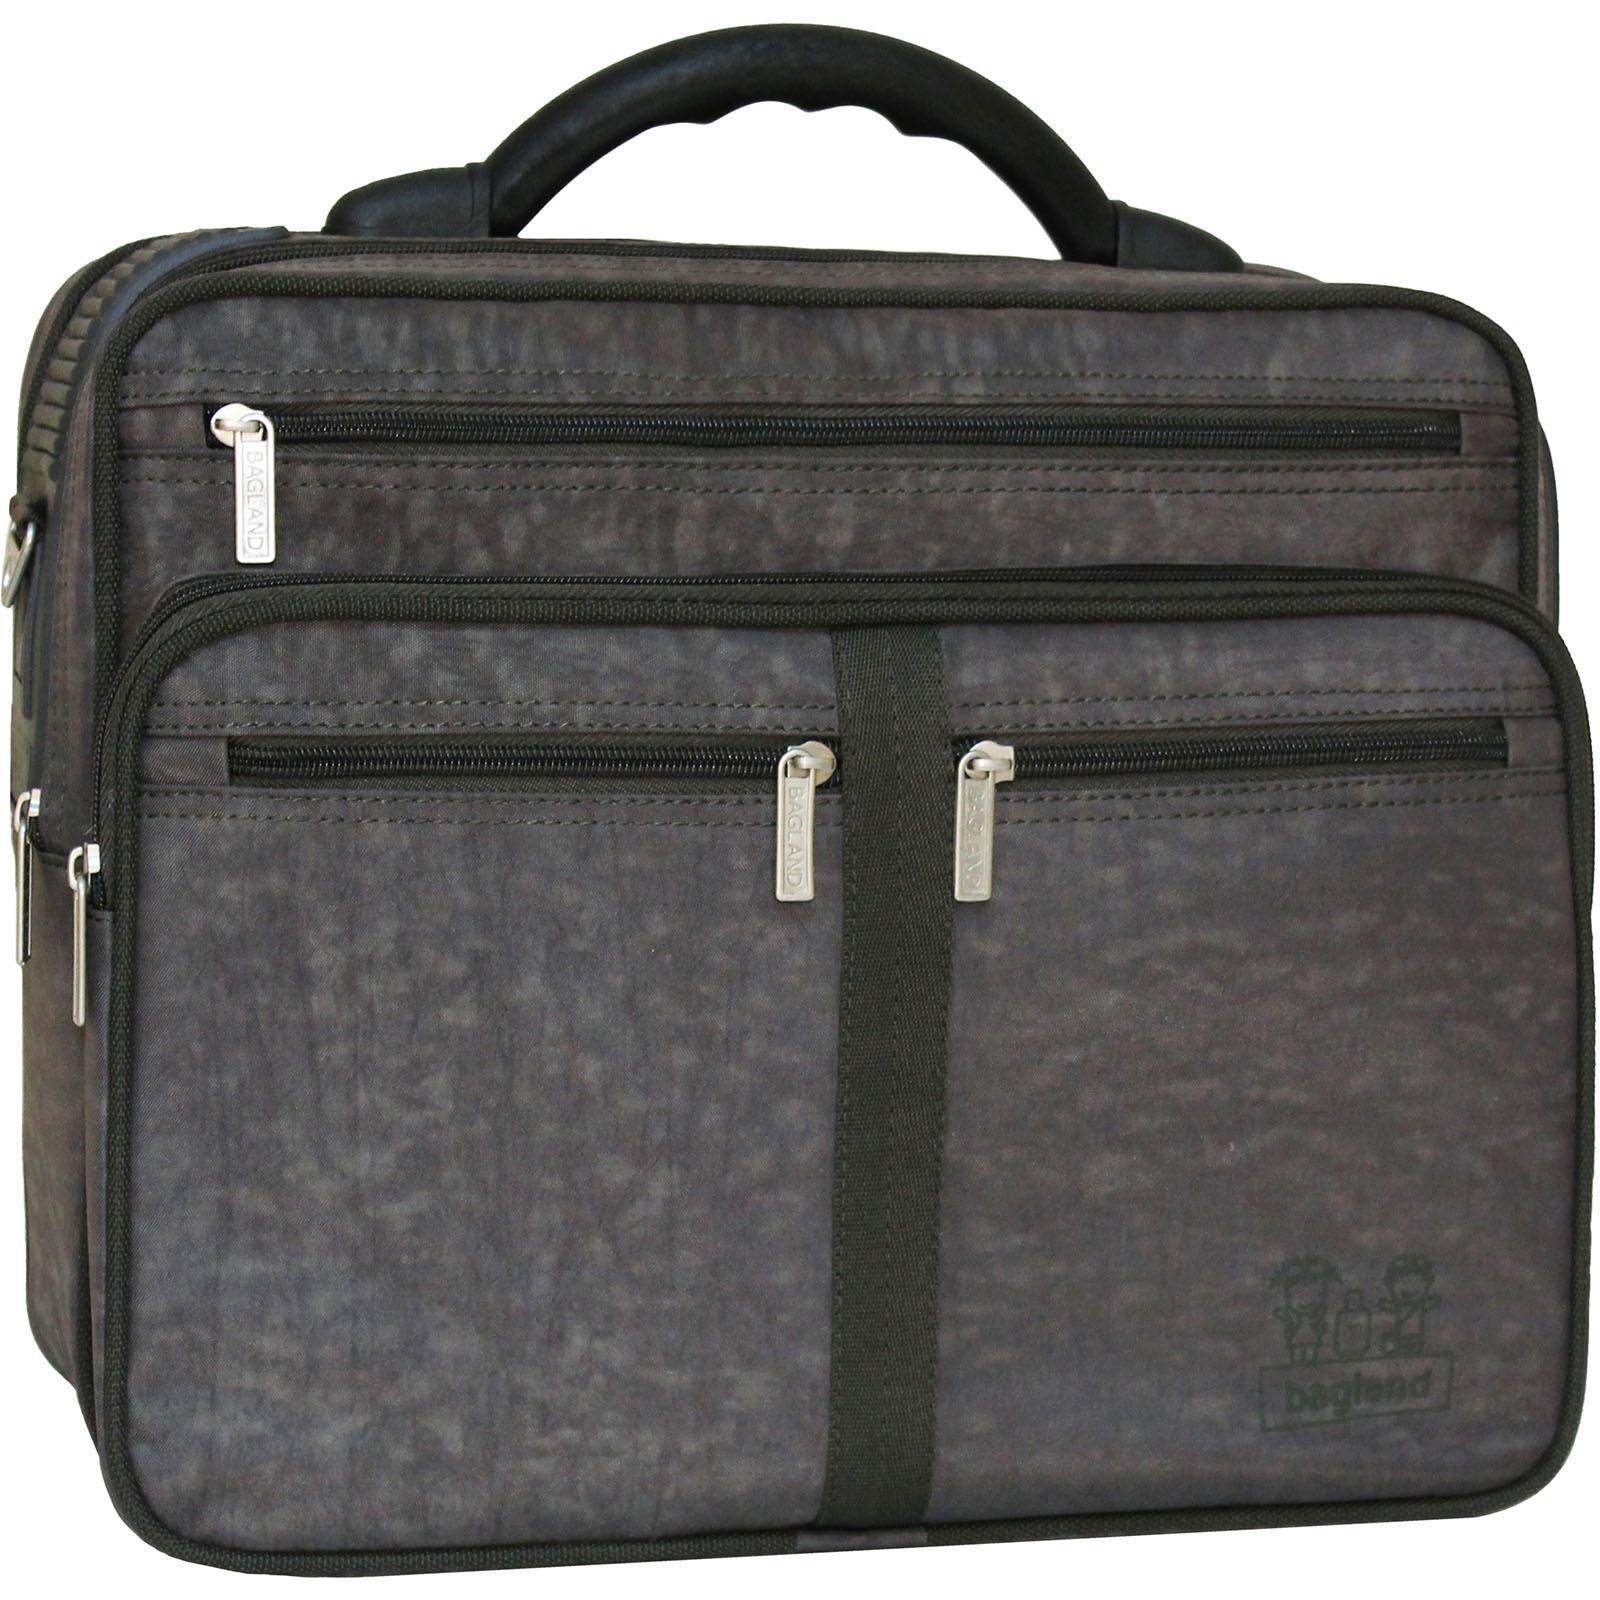 Сумки через плечо Мужская сумка Bagland Mr.Green 16 л. 327 хаки (0025270) IMG_3470.JPG